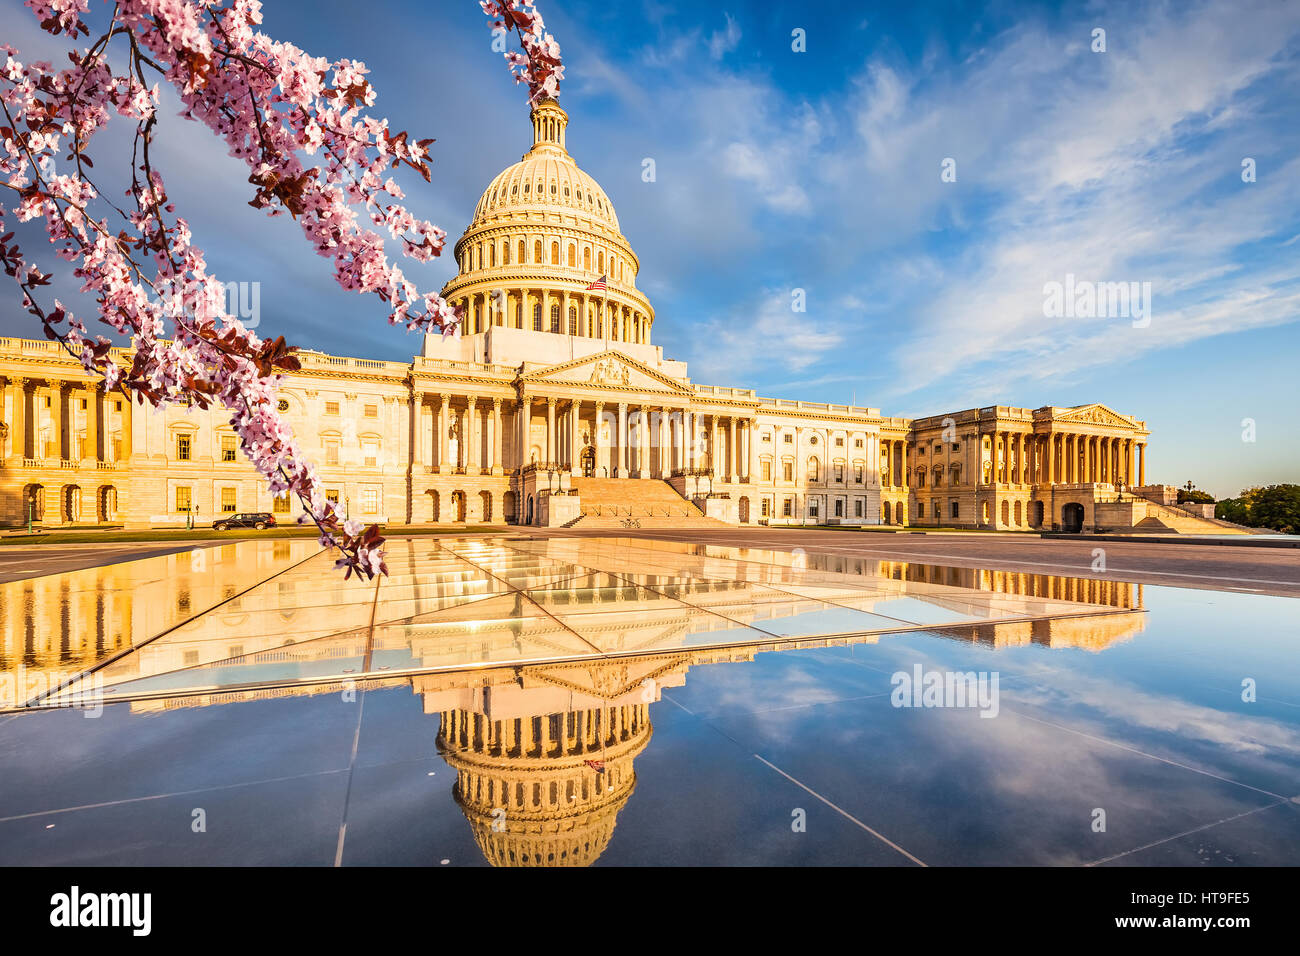 US Capitol sobre cielo azul con cerezos en flor en primer plano Imagen De Stock